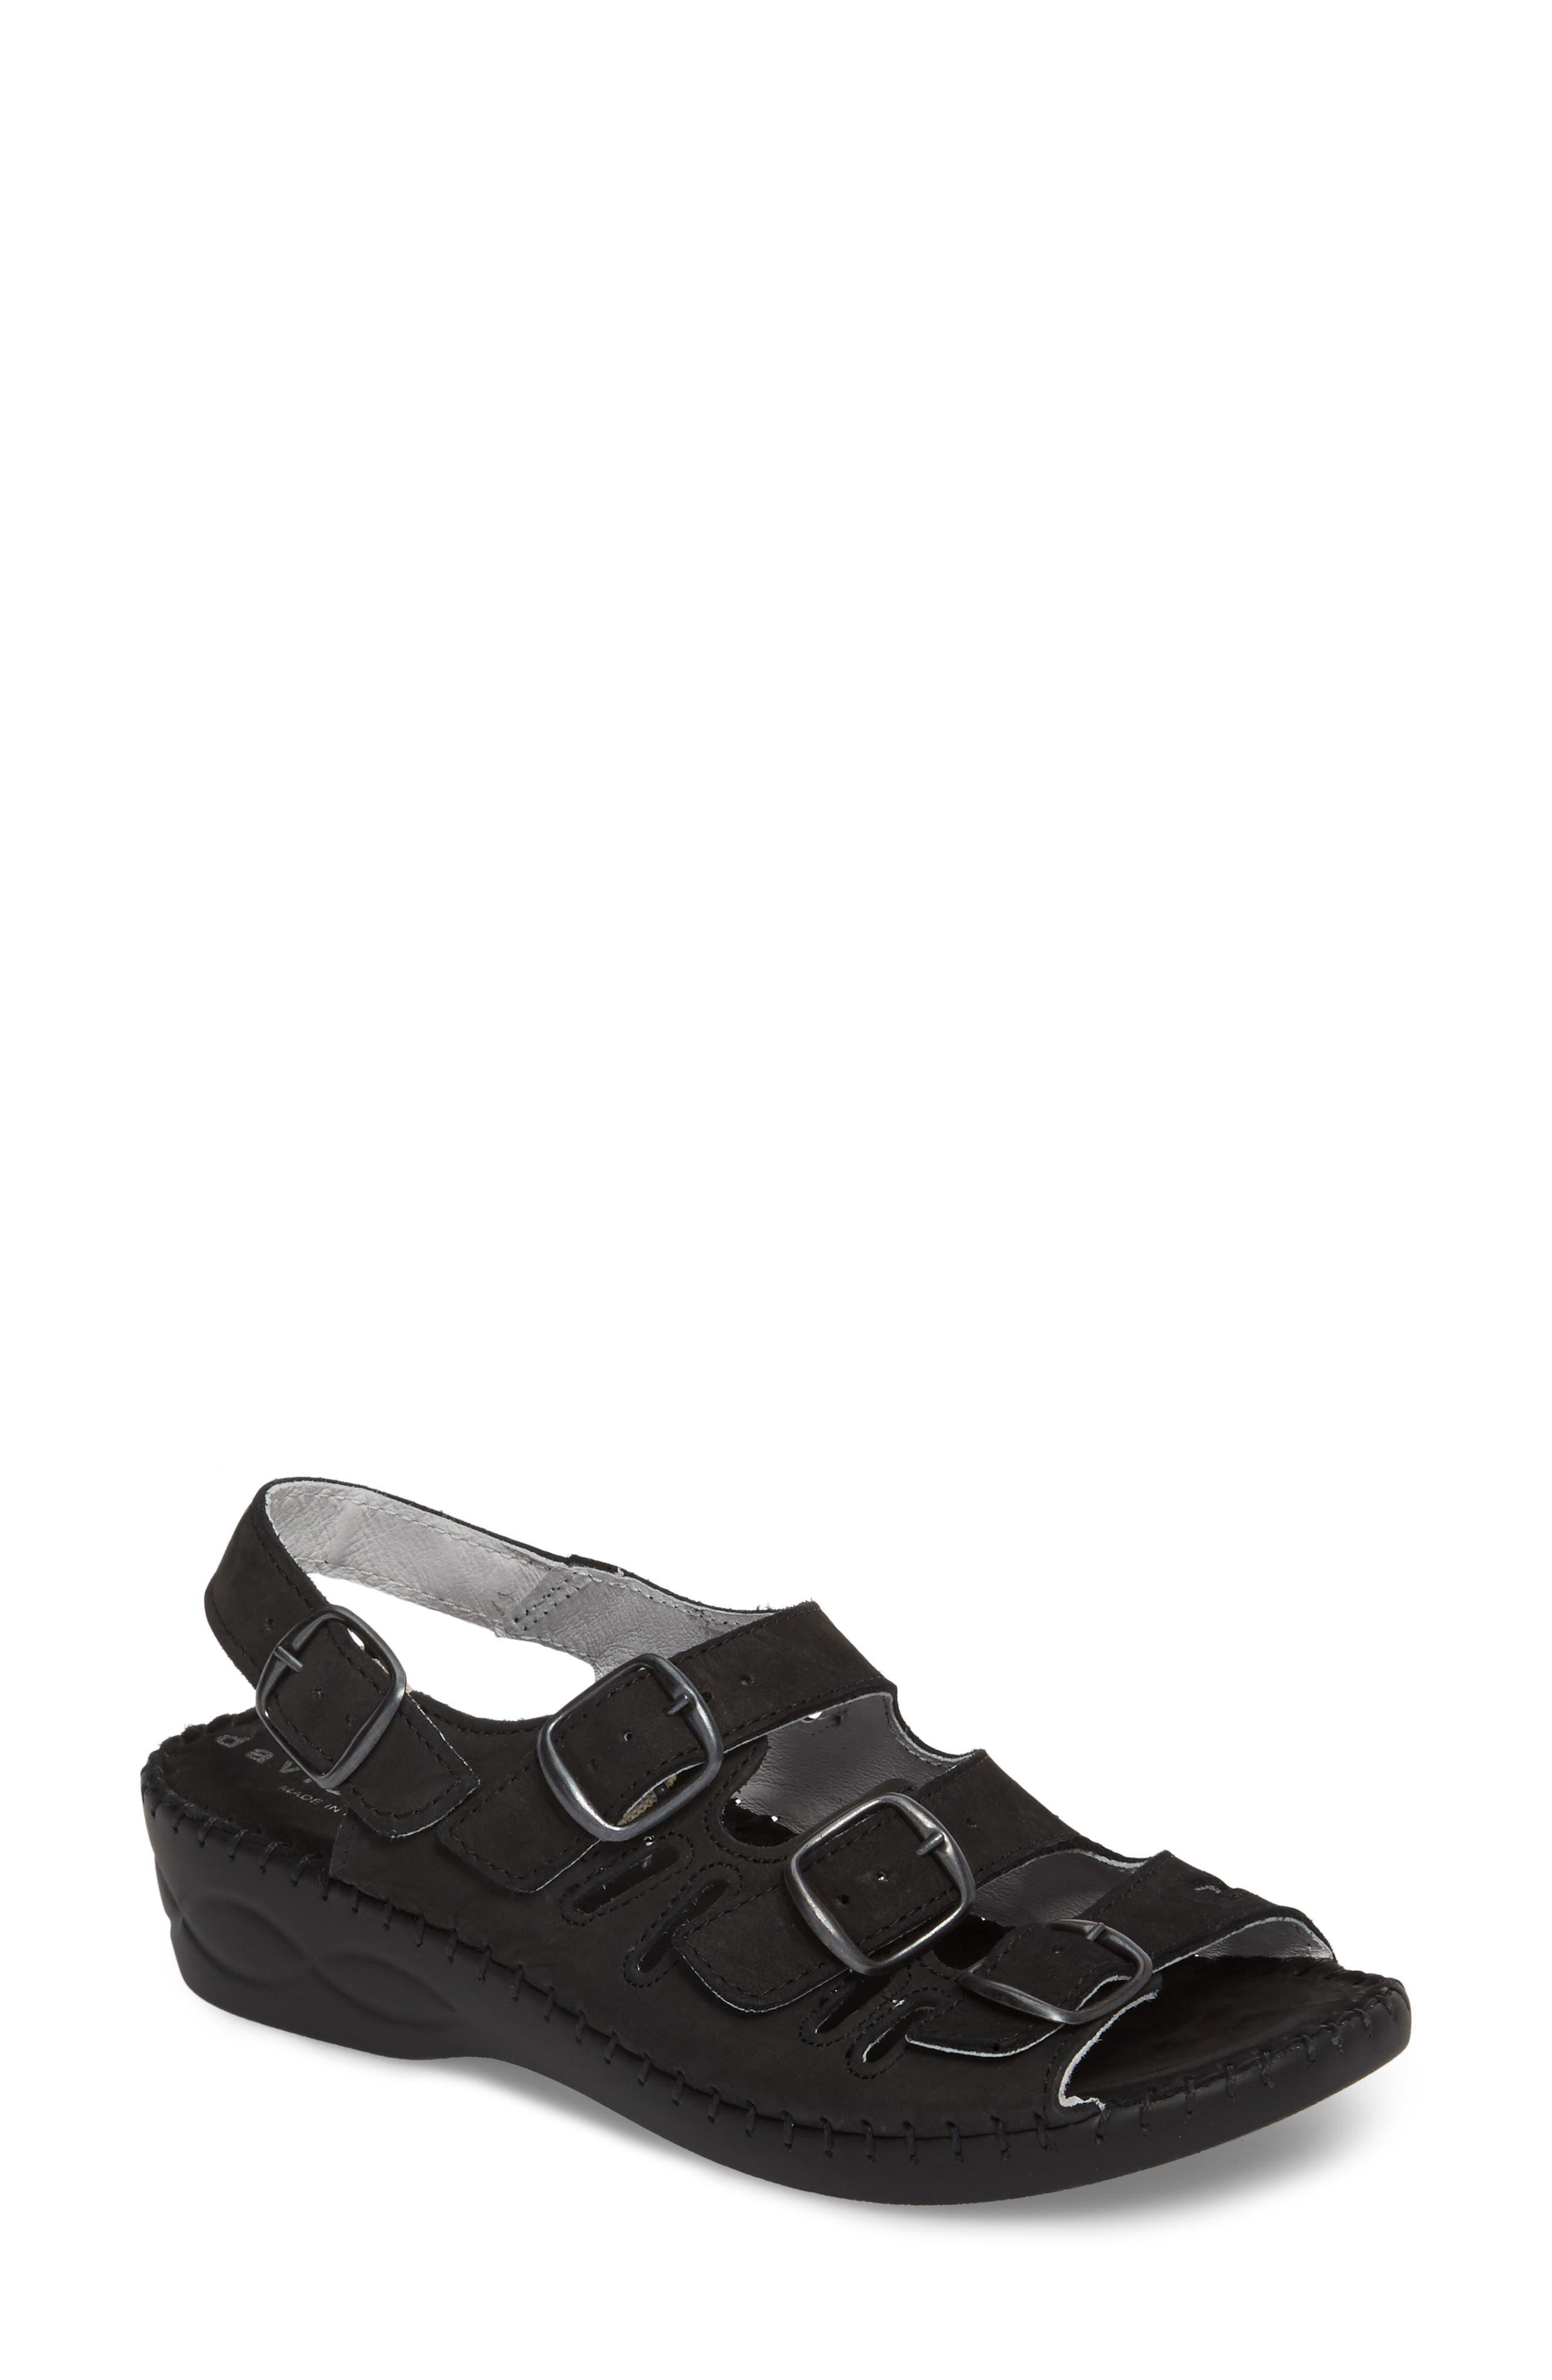 Luna Slingback Wedge Sandal,                             Main thumbnail 1, color,                             BLACK NUBUCK